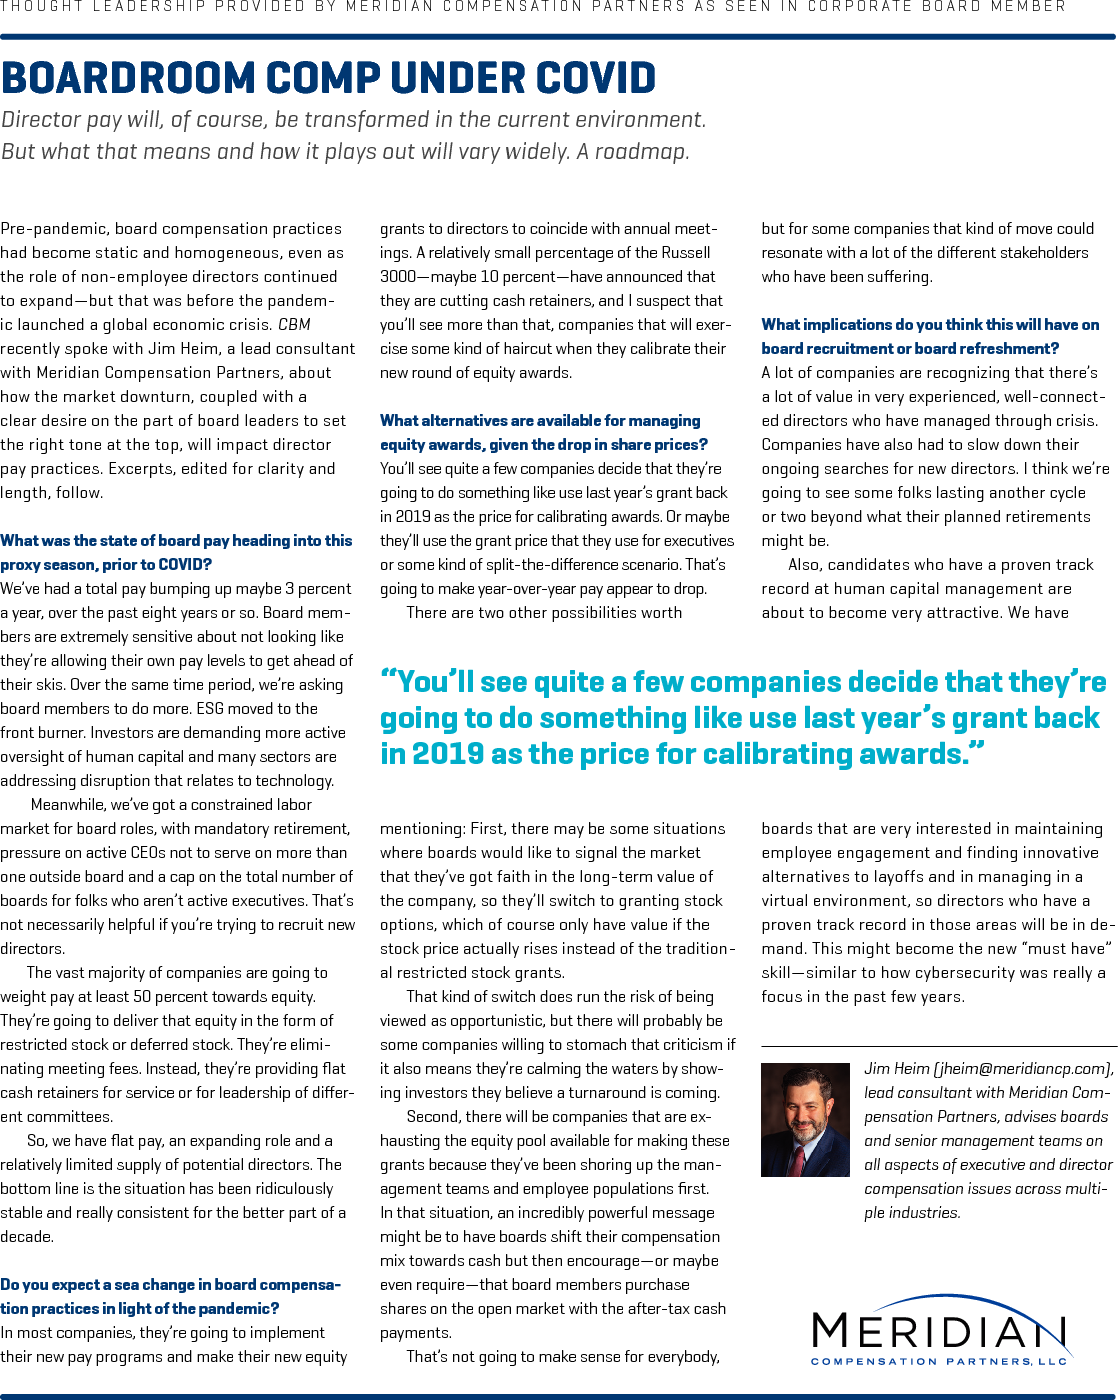 Boardroom Comp Under COVID-19 (PDF)